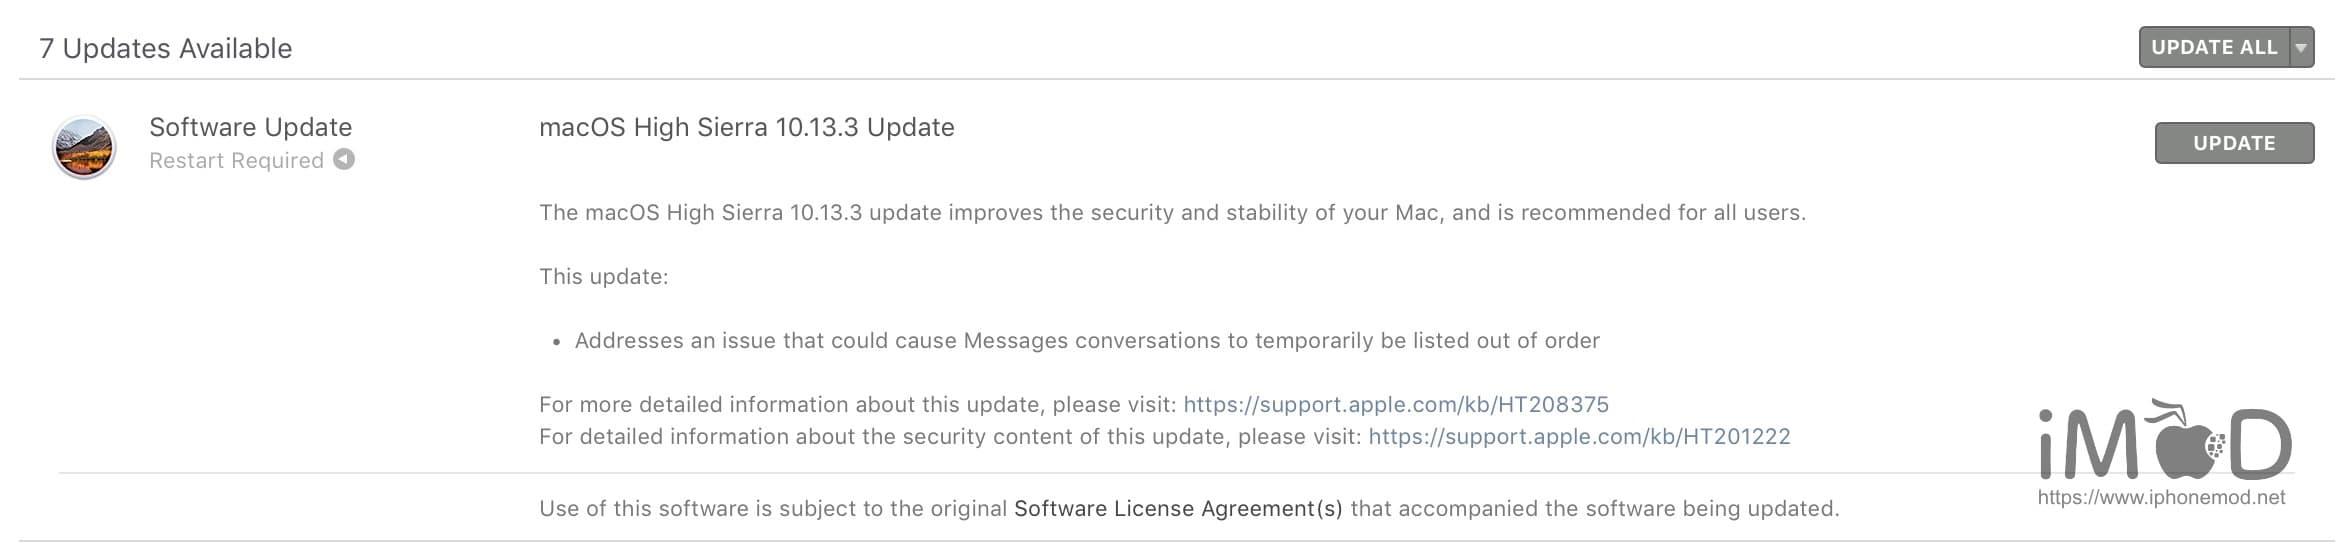 Macos 10.3.3 Released